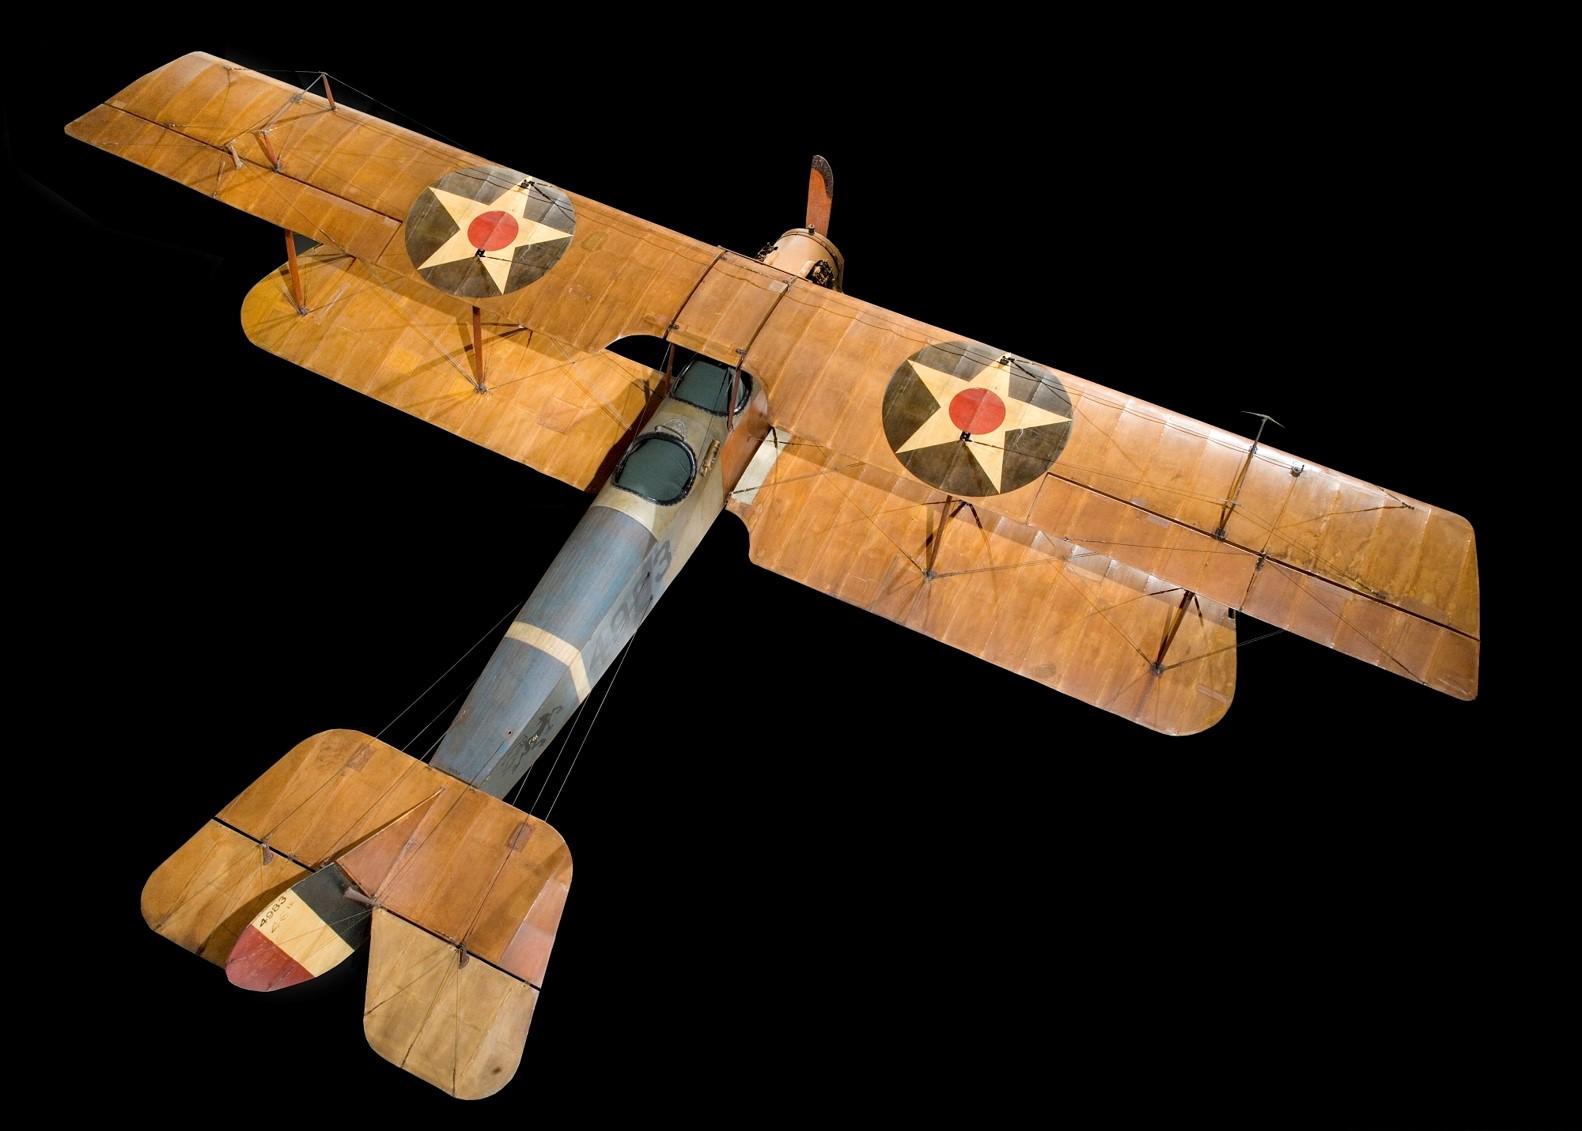 Smithsonian - Curtiss Jenny aircraft 2